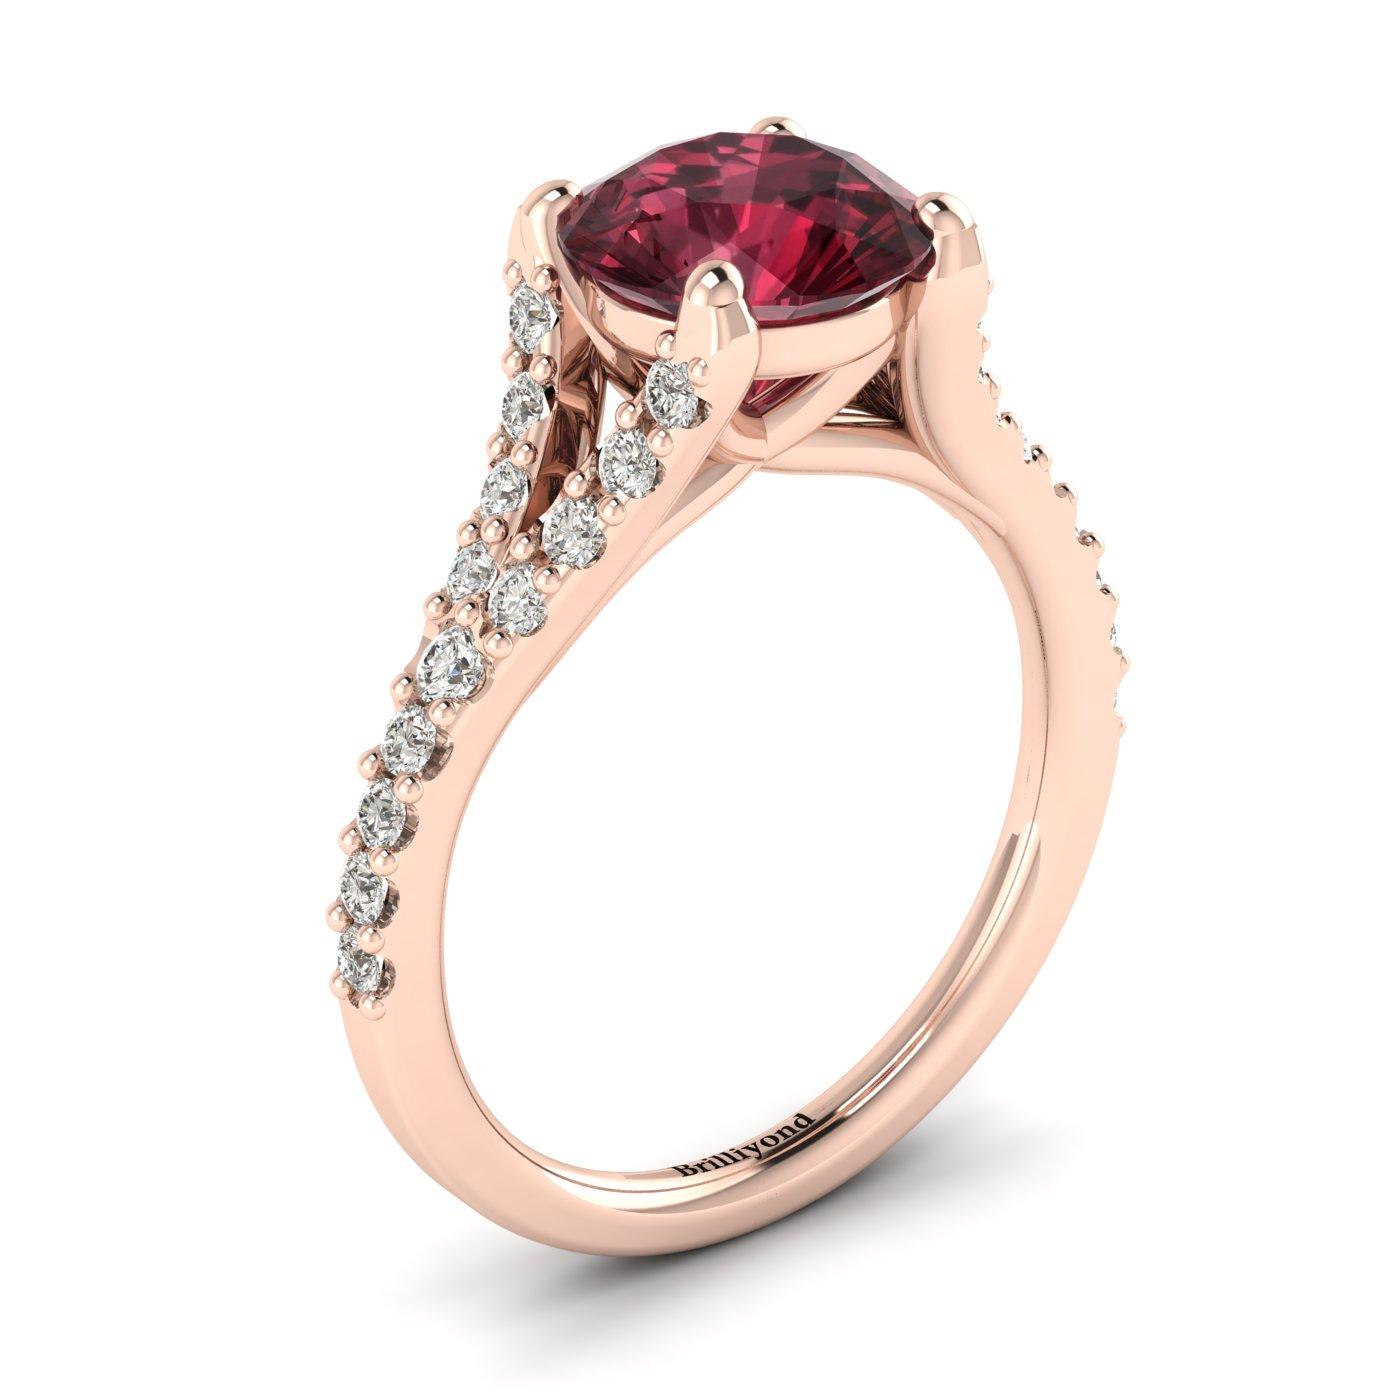 A natural 6mm round cut garnet handset over an 18k rose gold engagement ring.